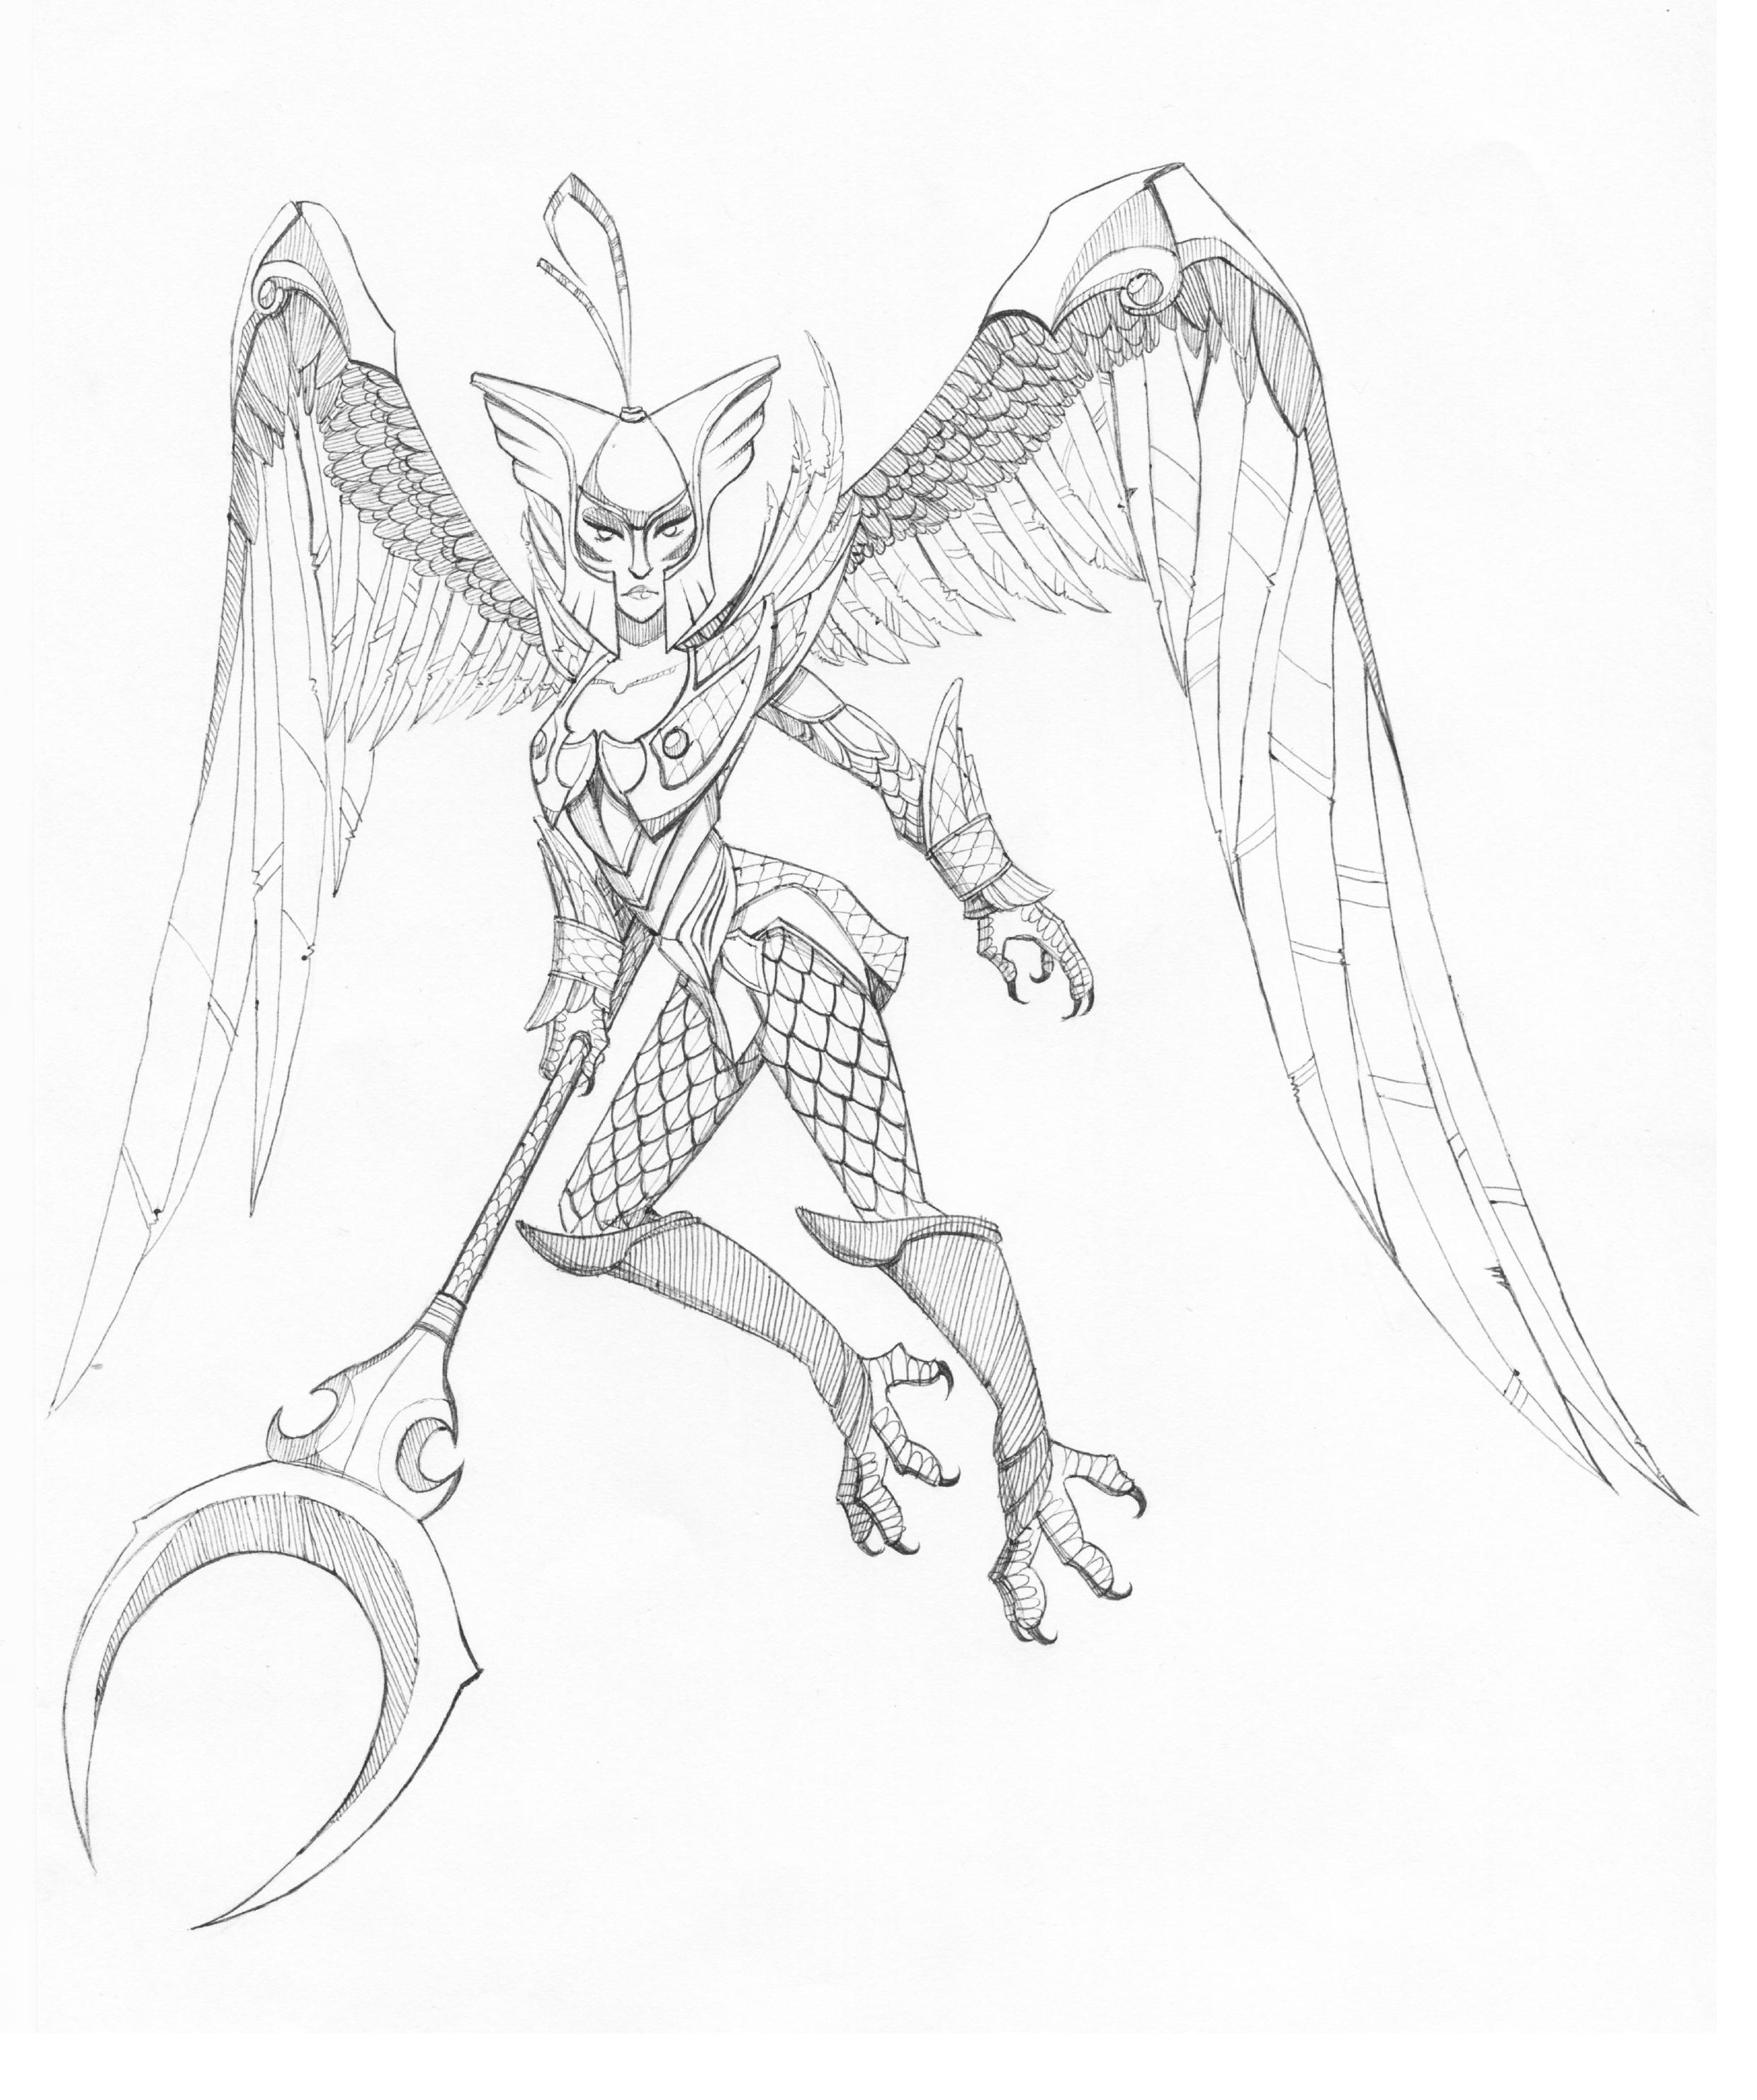 Skywrath mage (girl version)